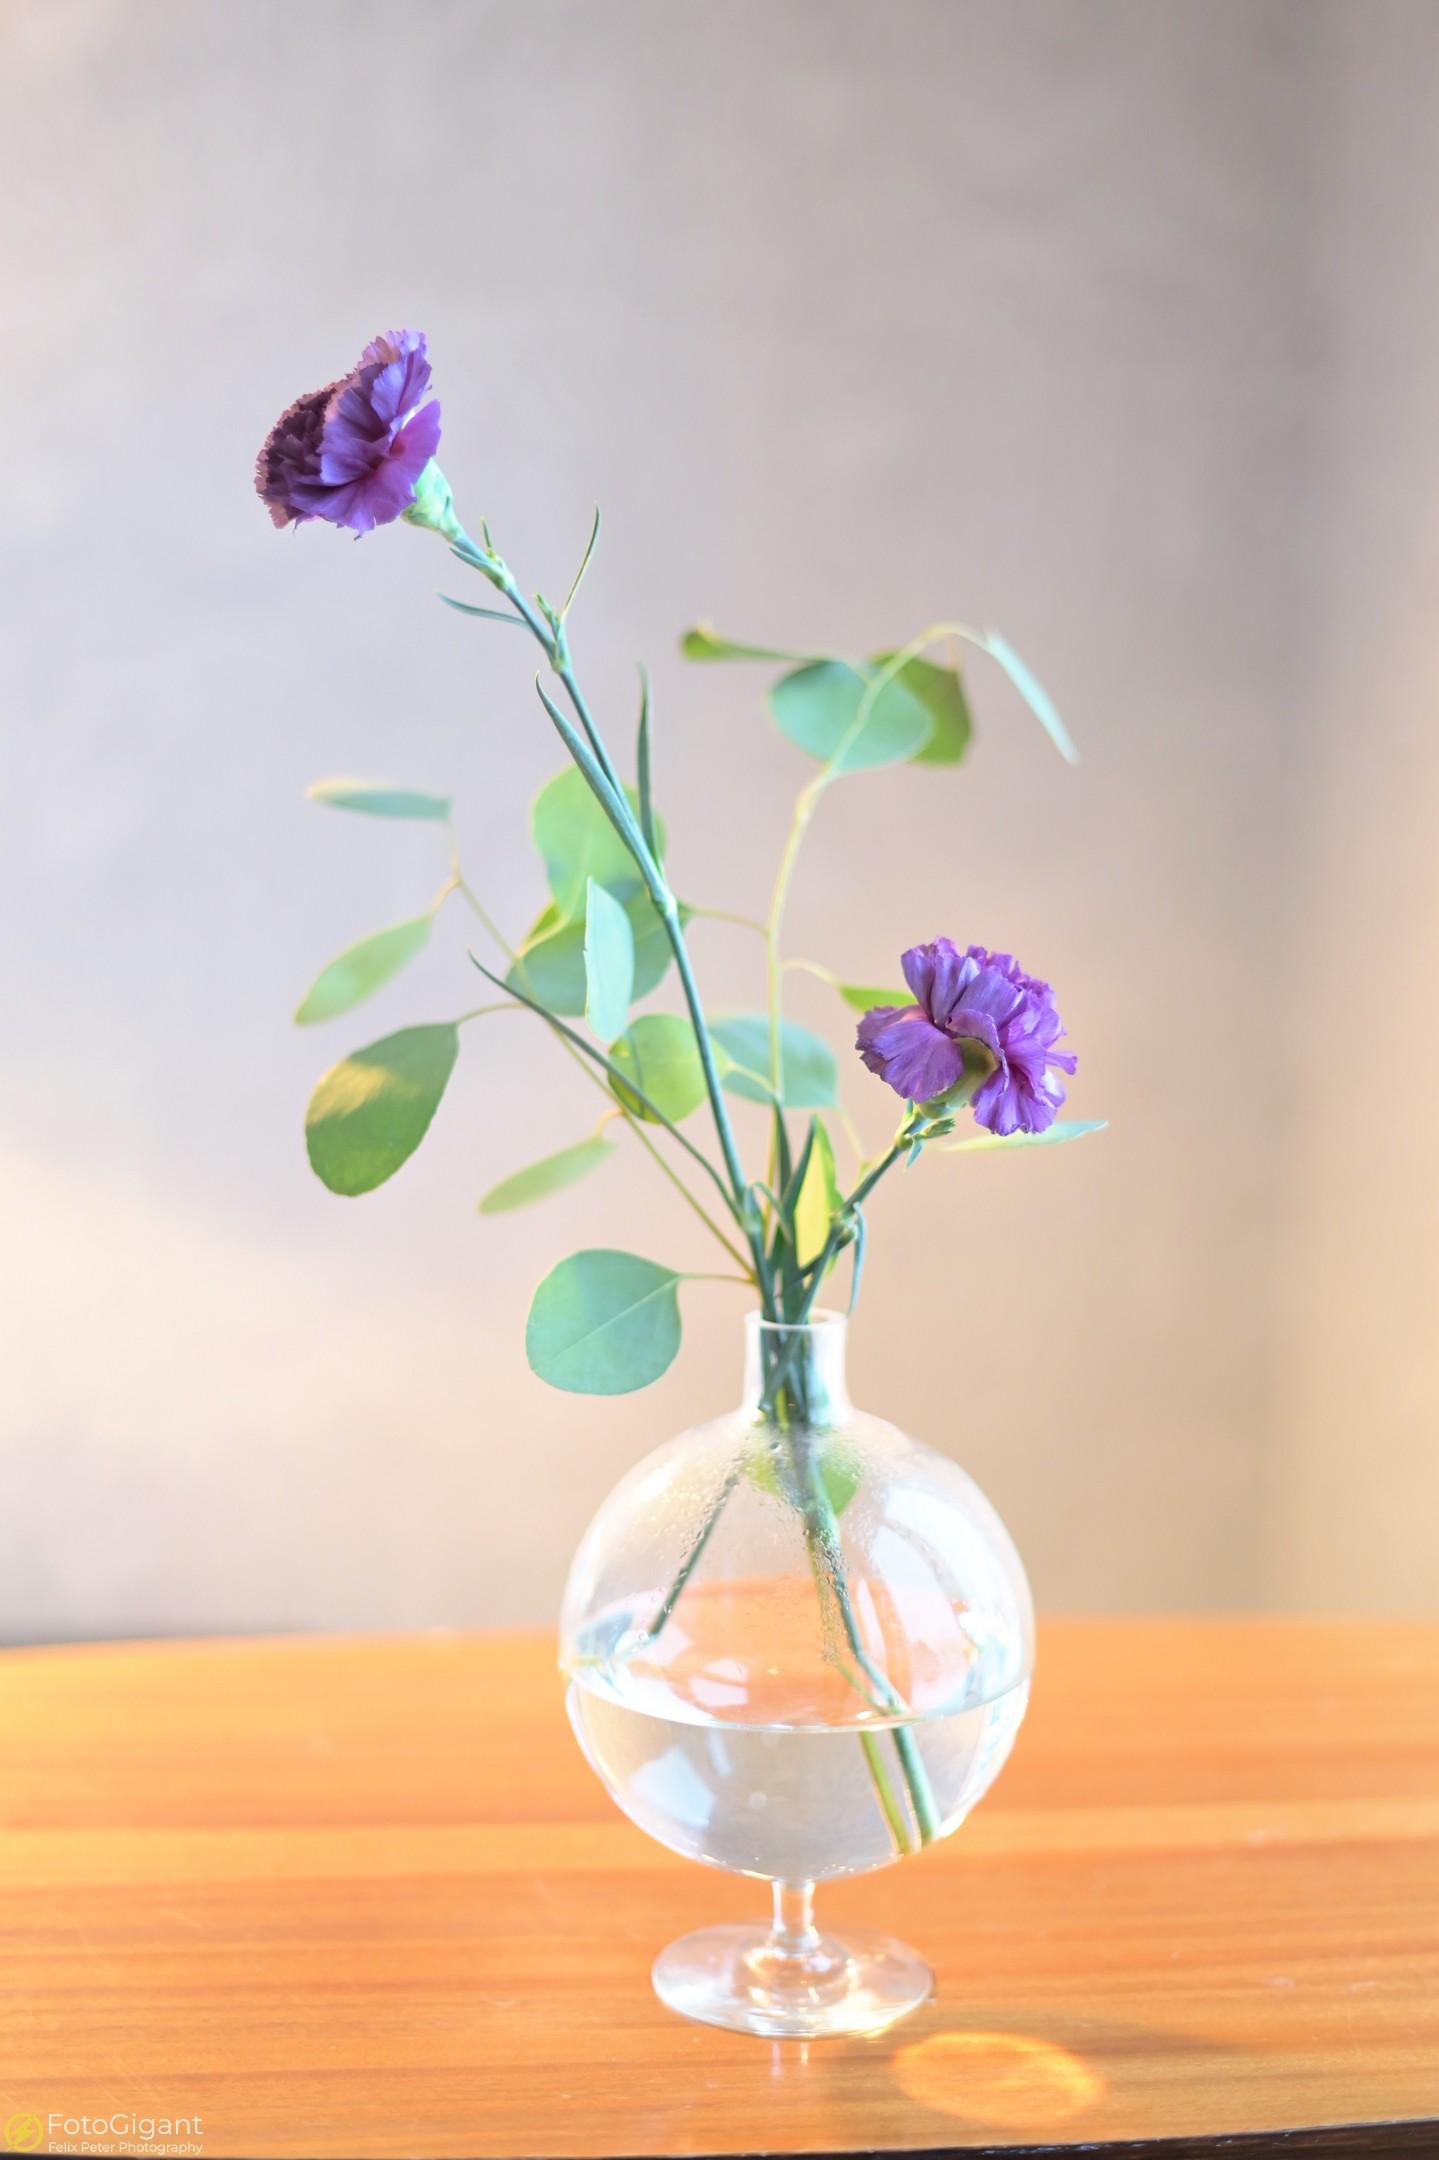 Flower-Photography_3.jpg